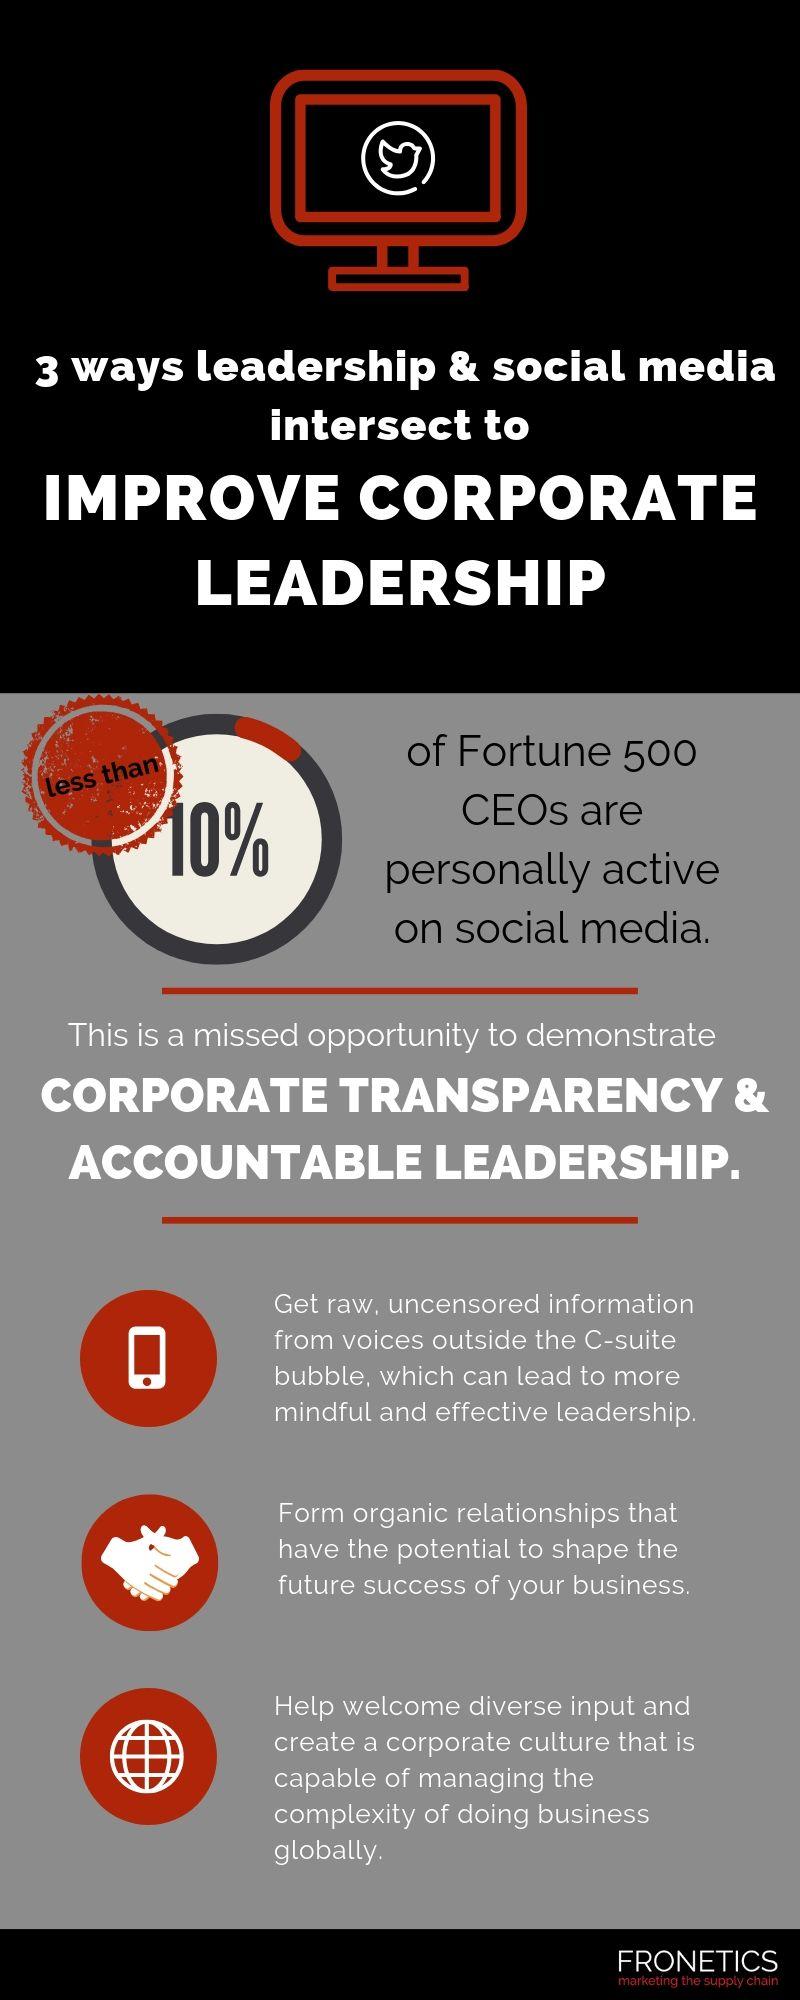 Leadership and social media